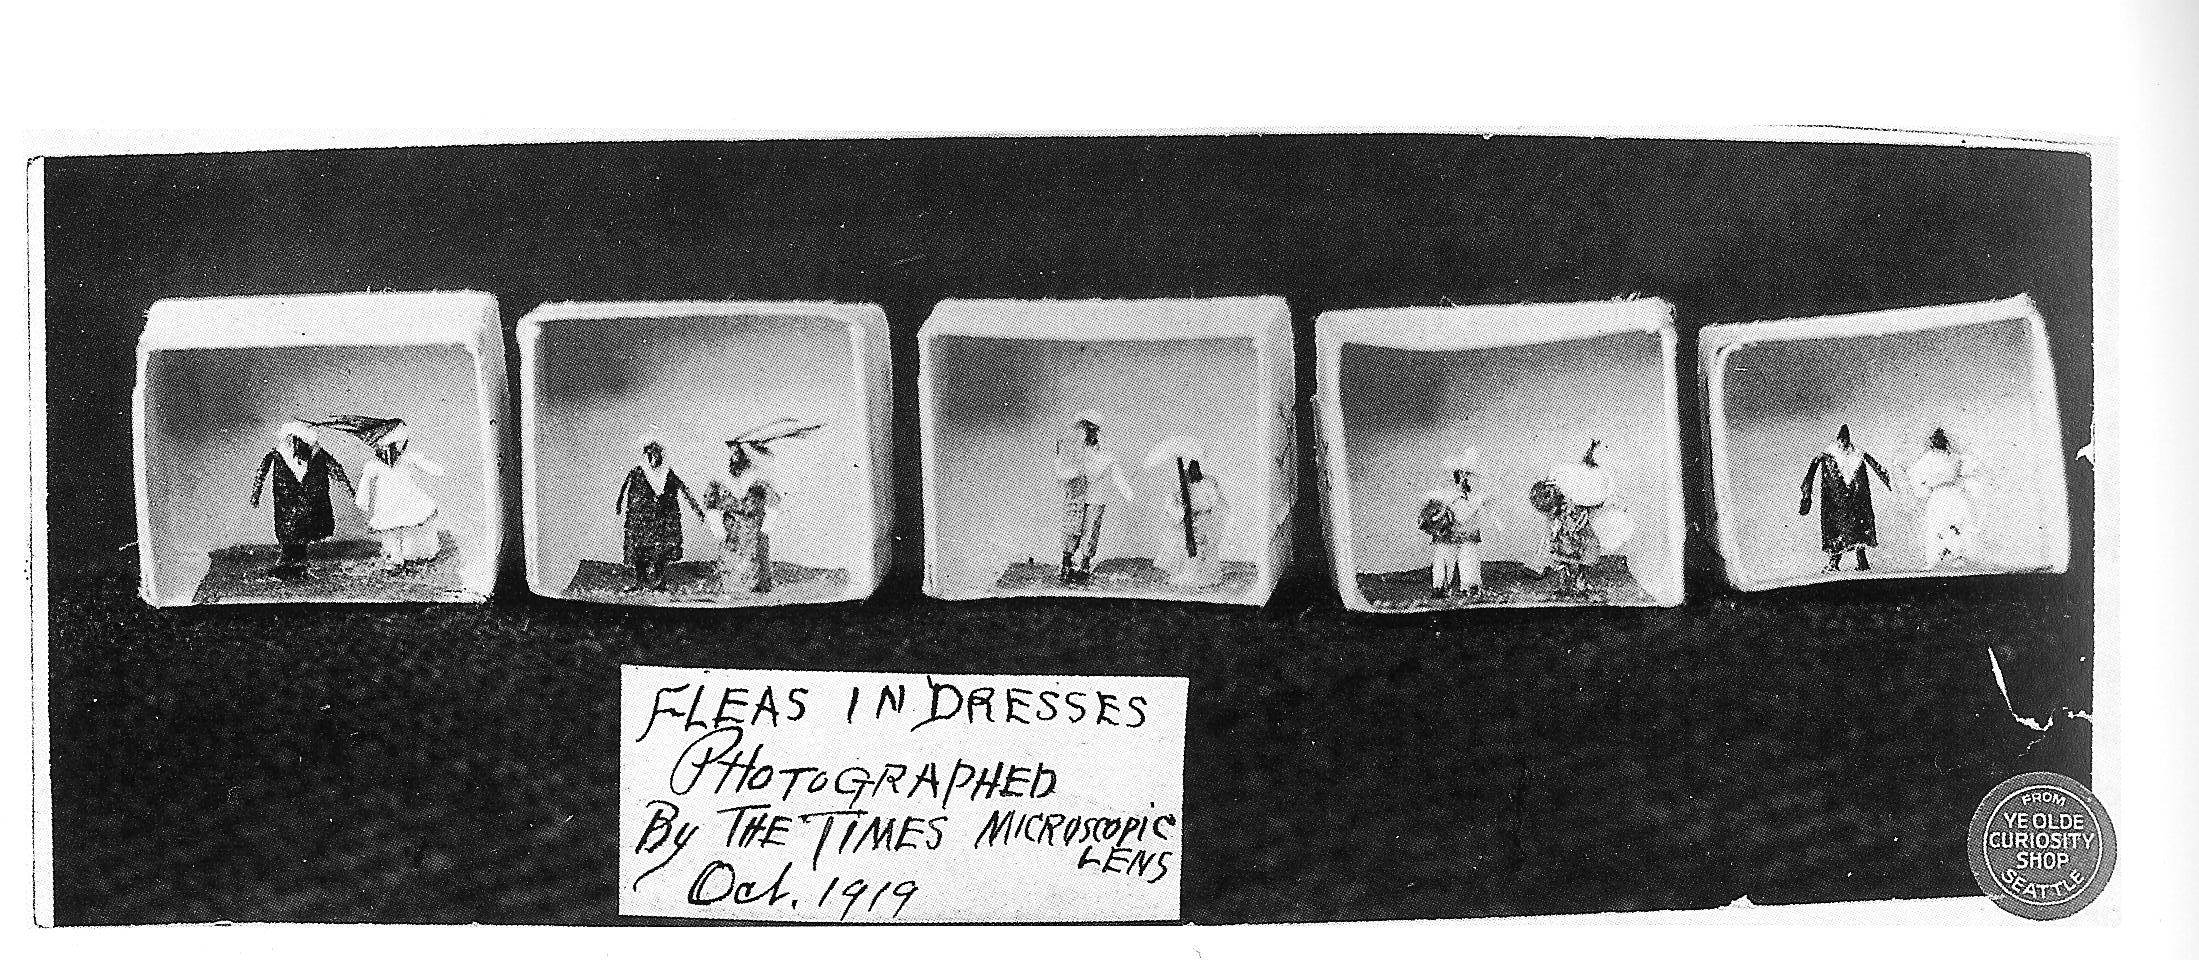 Fleas_in_dresses_at_Ye_Olde_Curiosity_Shop